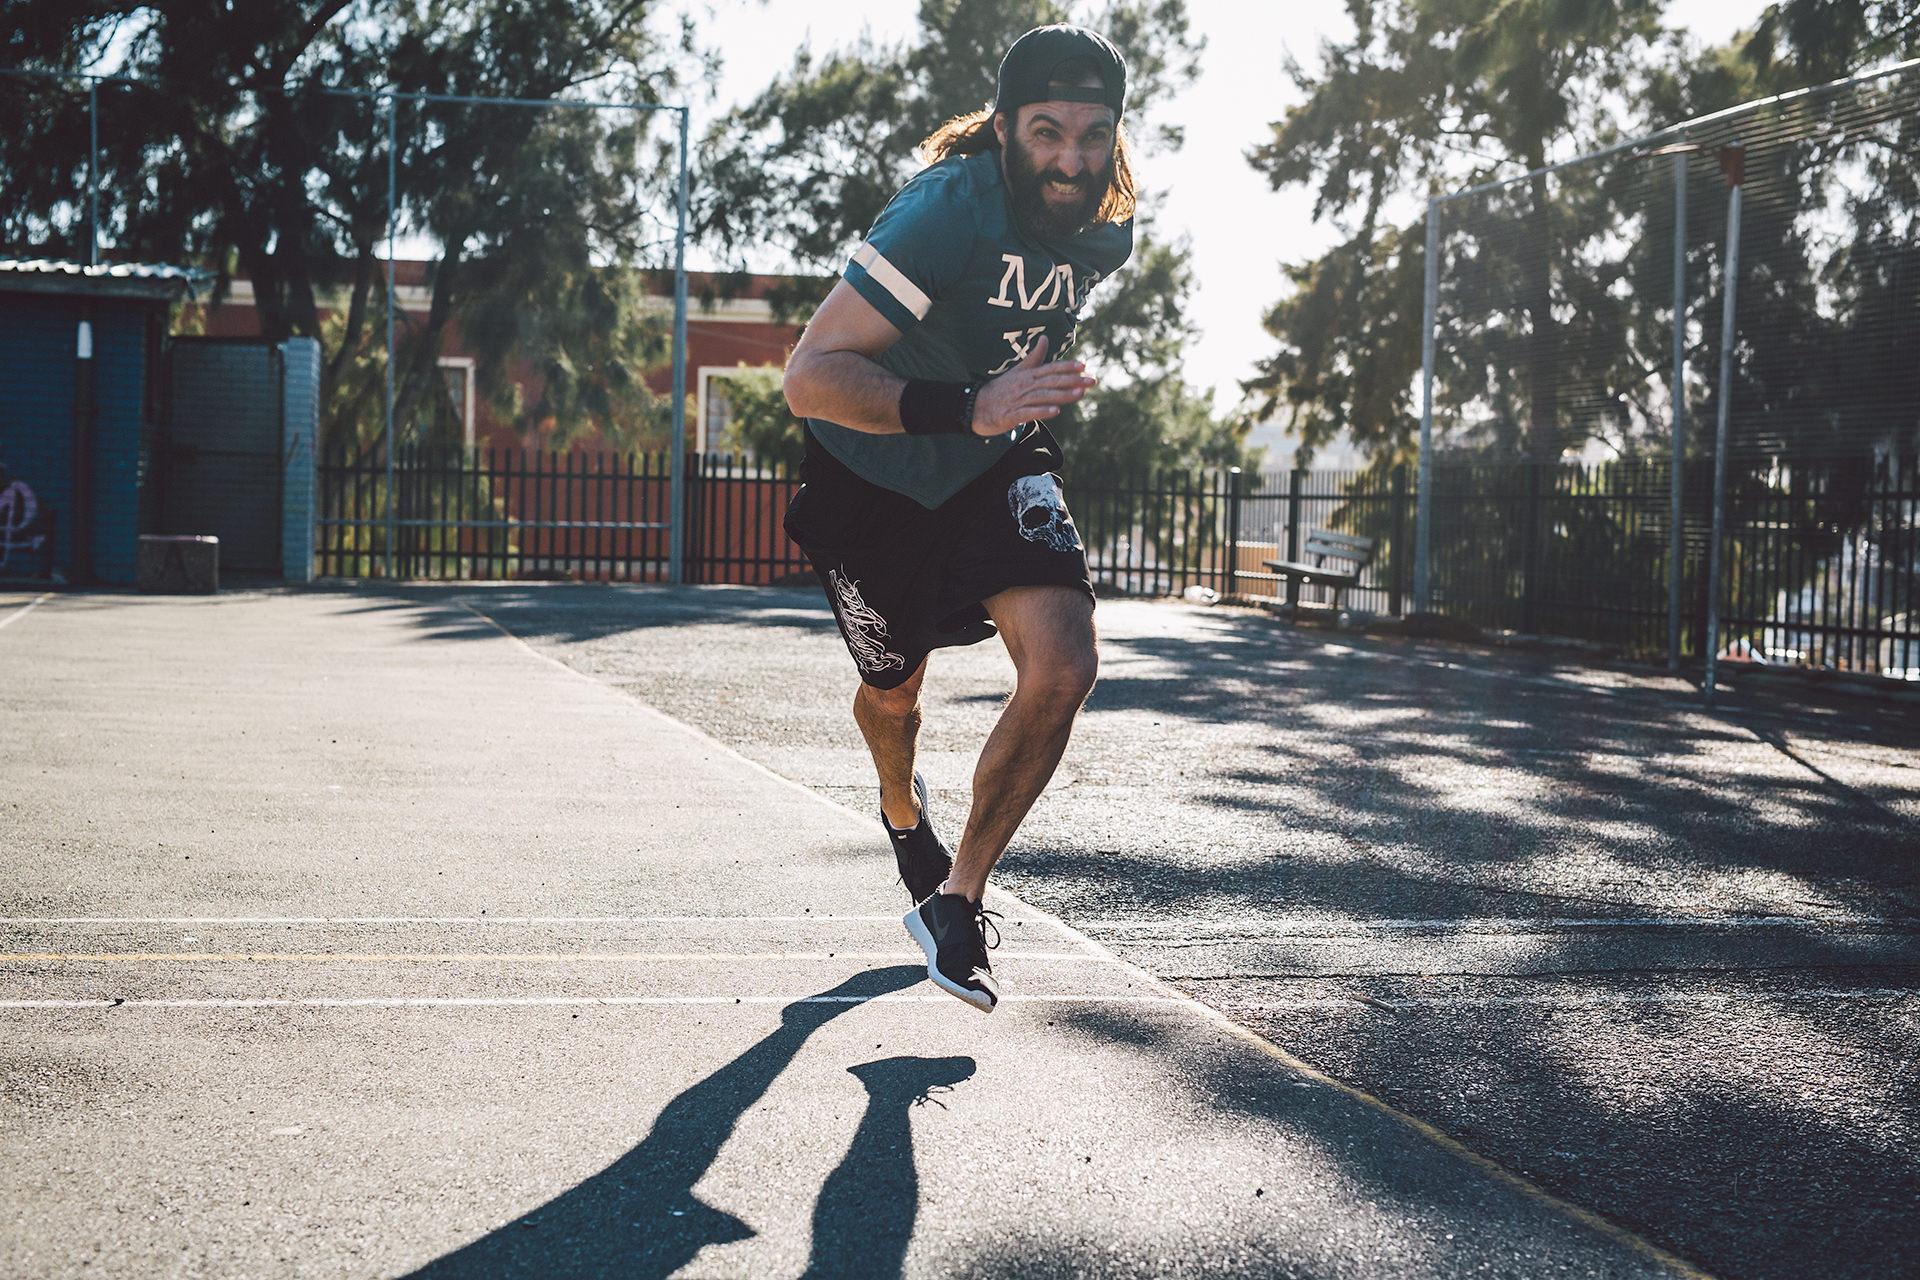 freeletics-sportplatz-sprint-trainieren